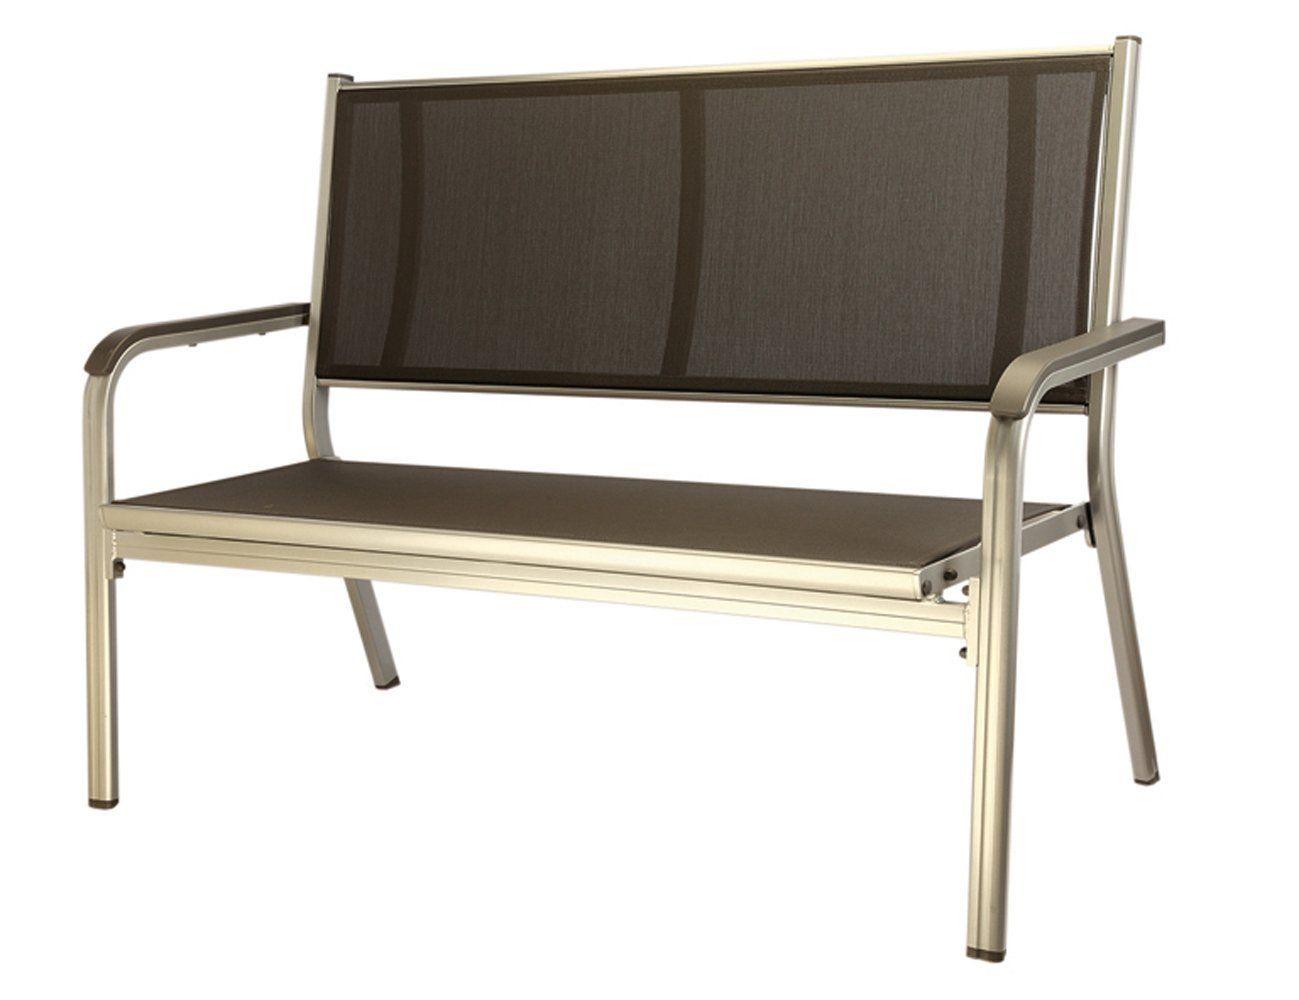 Gartenbank Kunststoff Kettler 2 Sitzer Basic Silber Anthrazit Modernes Design Aussenmobel Gartenstuhle